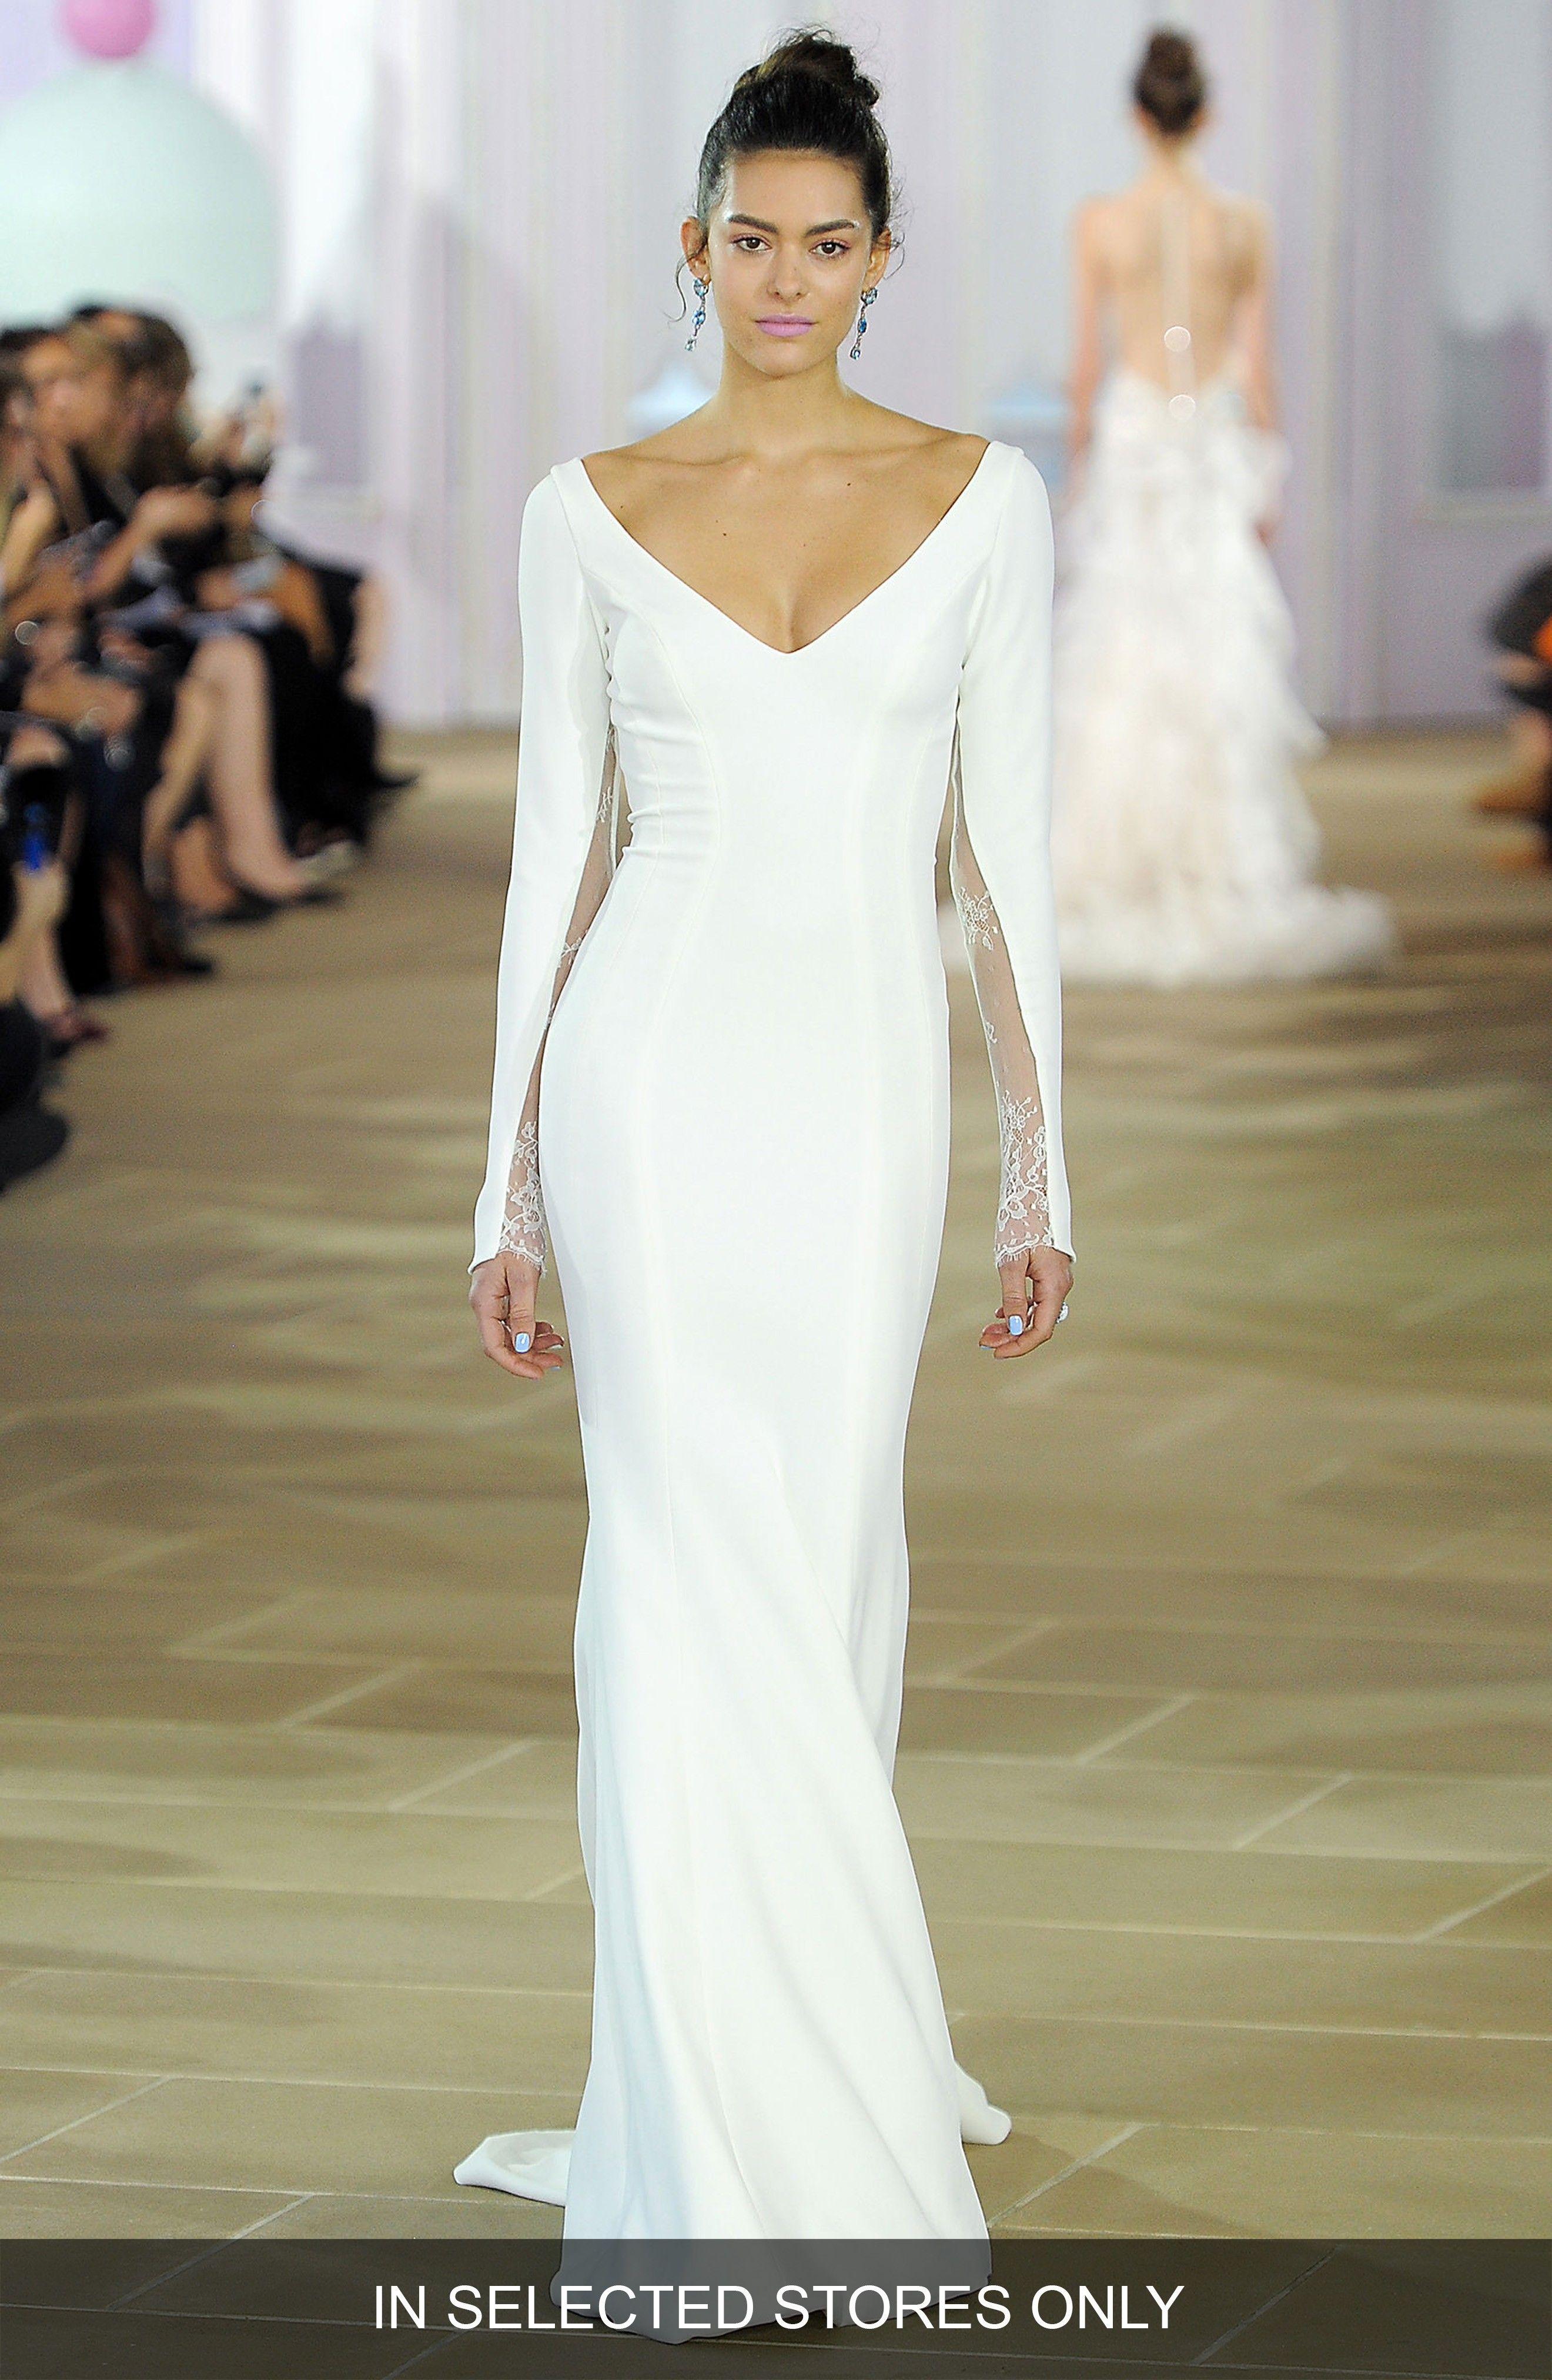 Image Result For Silk Crepe Wedding Dress Beautiful Dresses